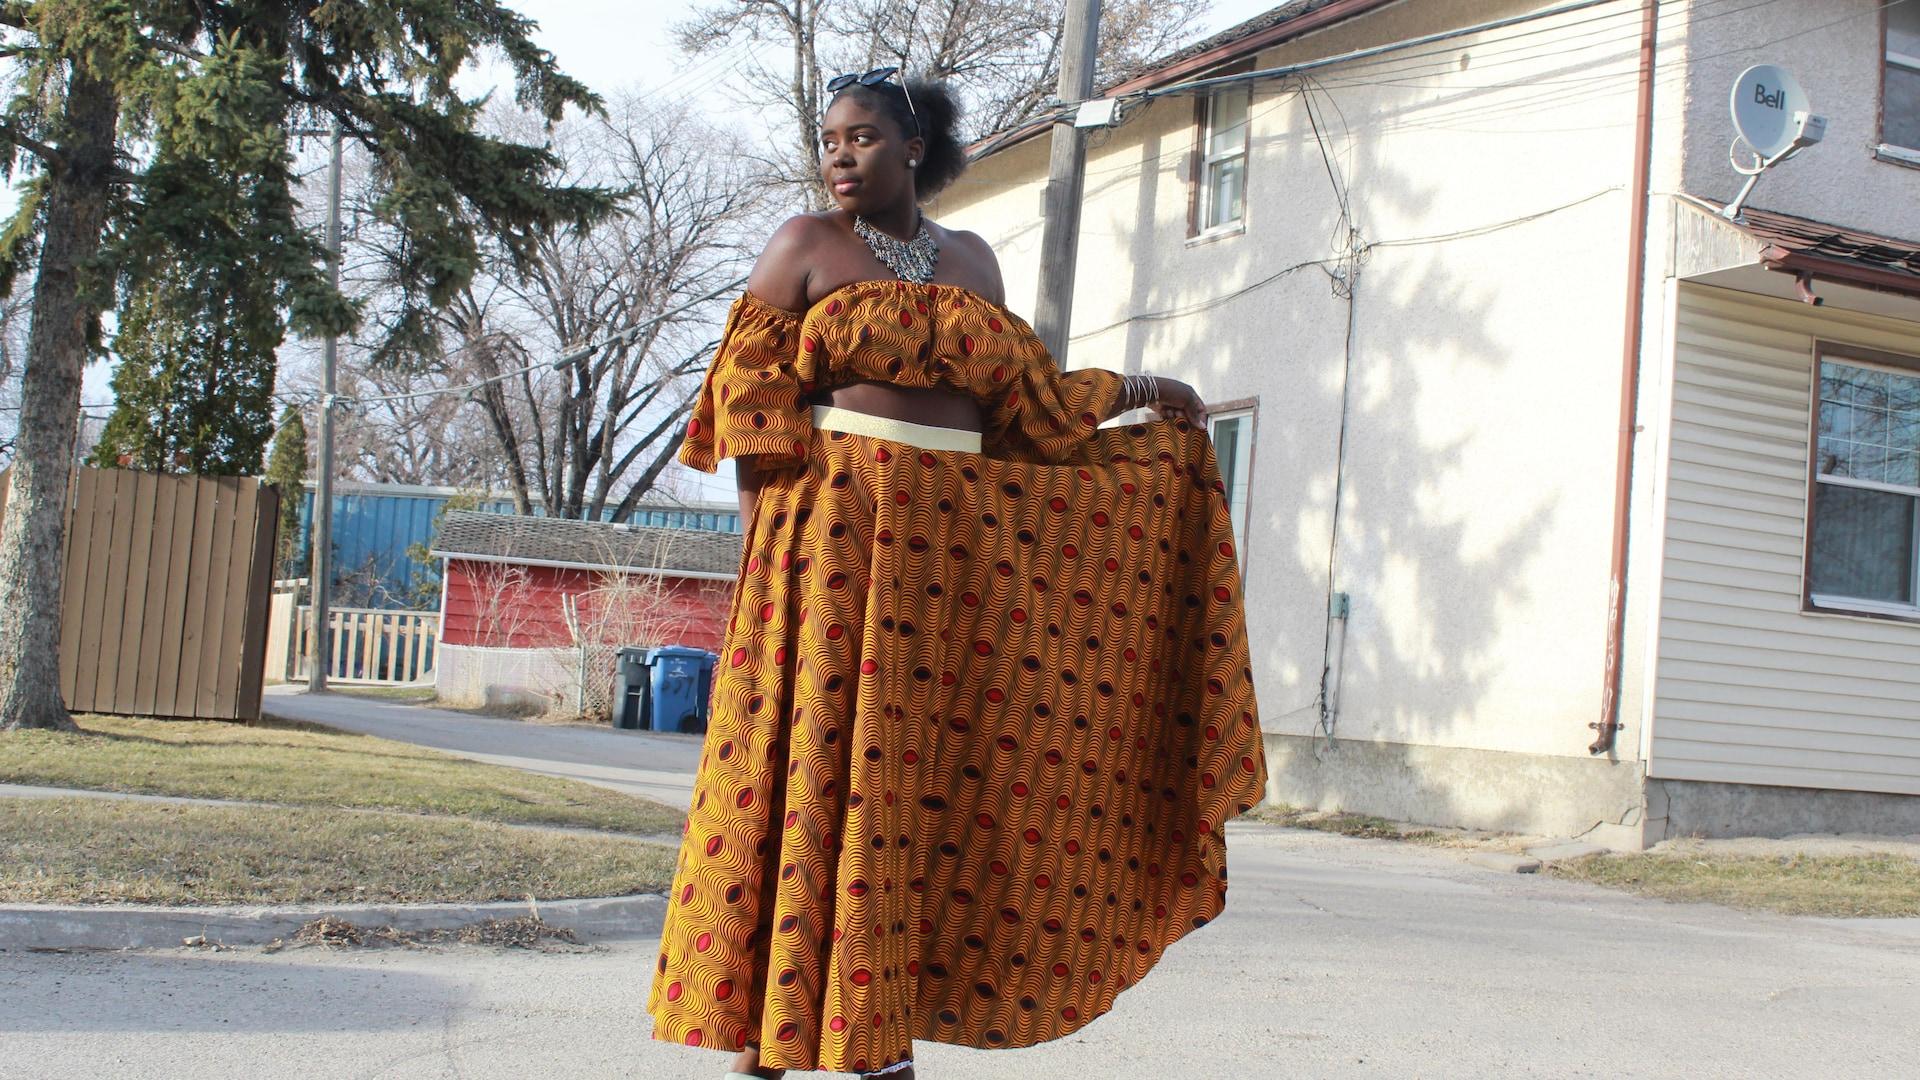 Une dame, dans la rue, pose avec sa robe en pagne.